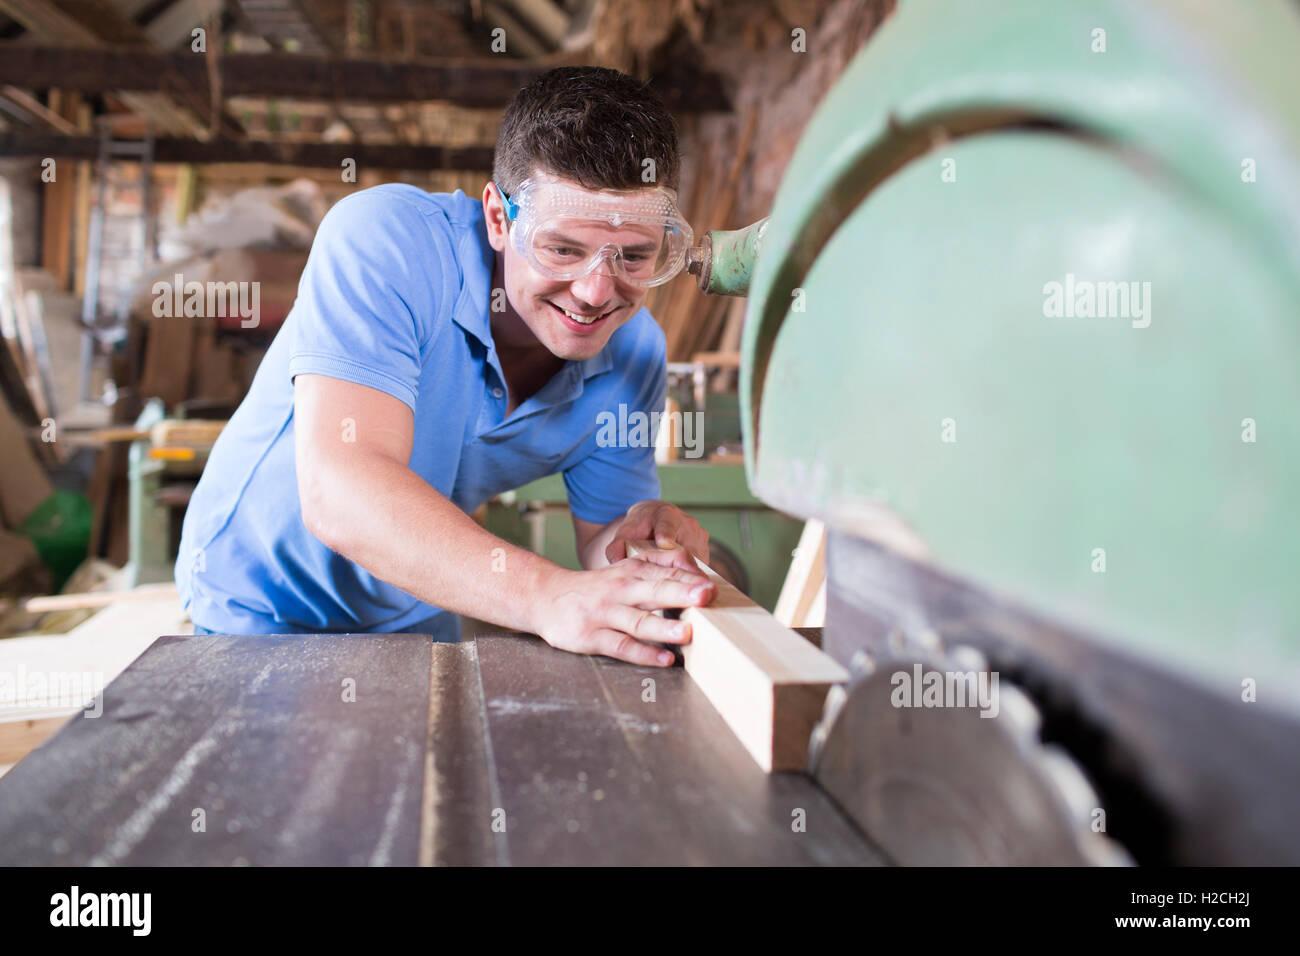 Carpenter Cutting Wood On Circular Saw - Stock Image